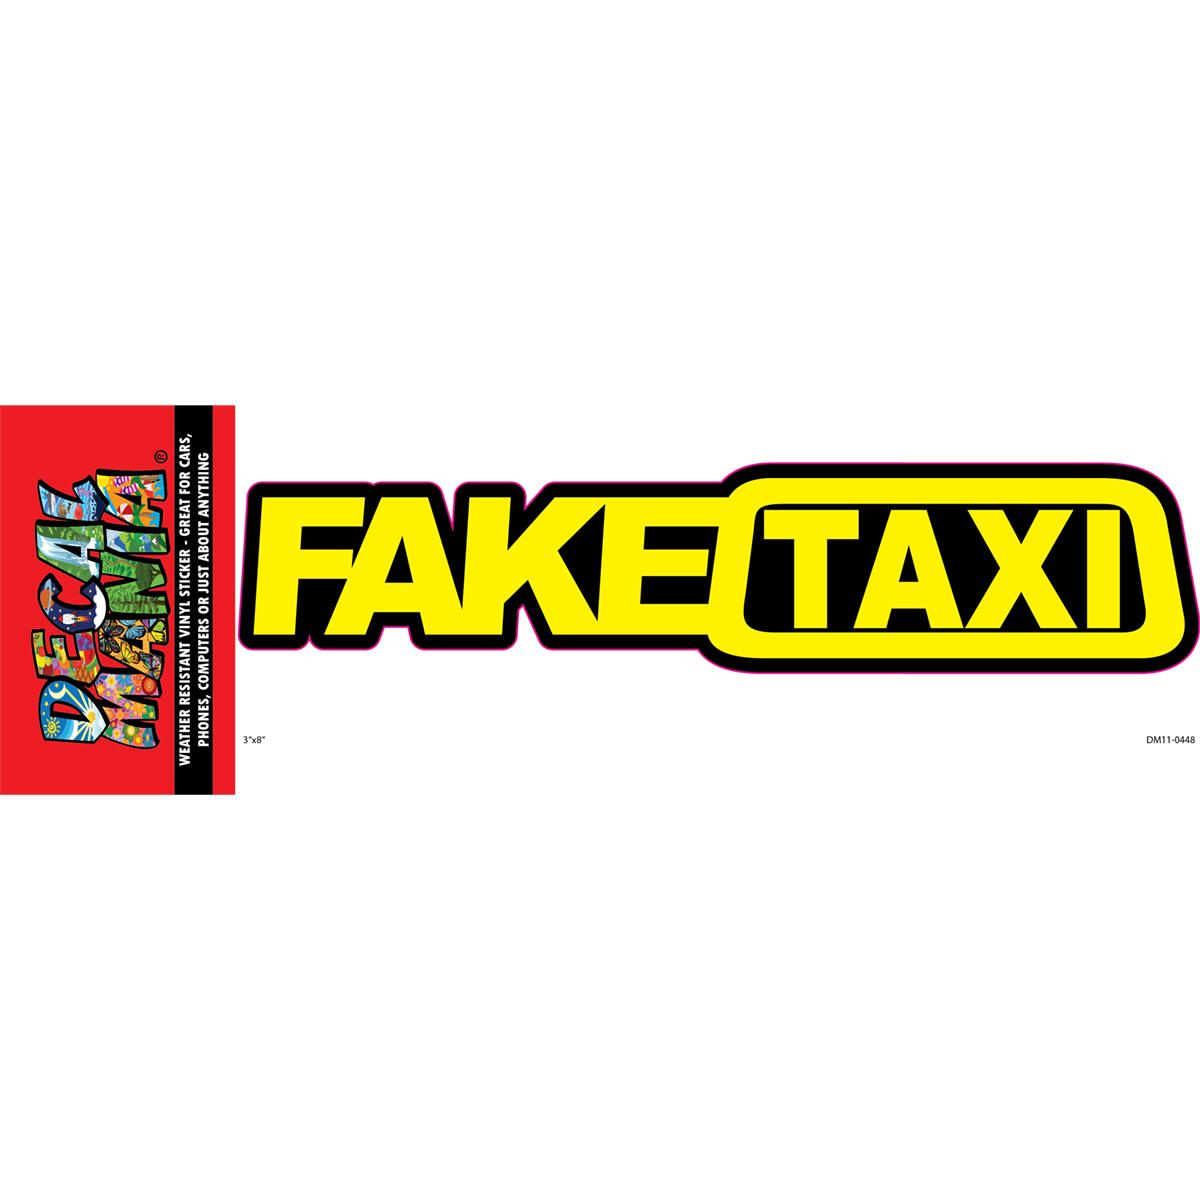 DecalMania - Fake Taxi 1PK 8in